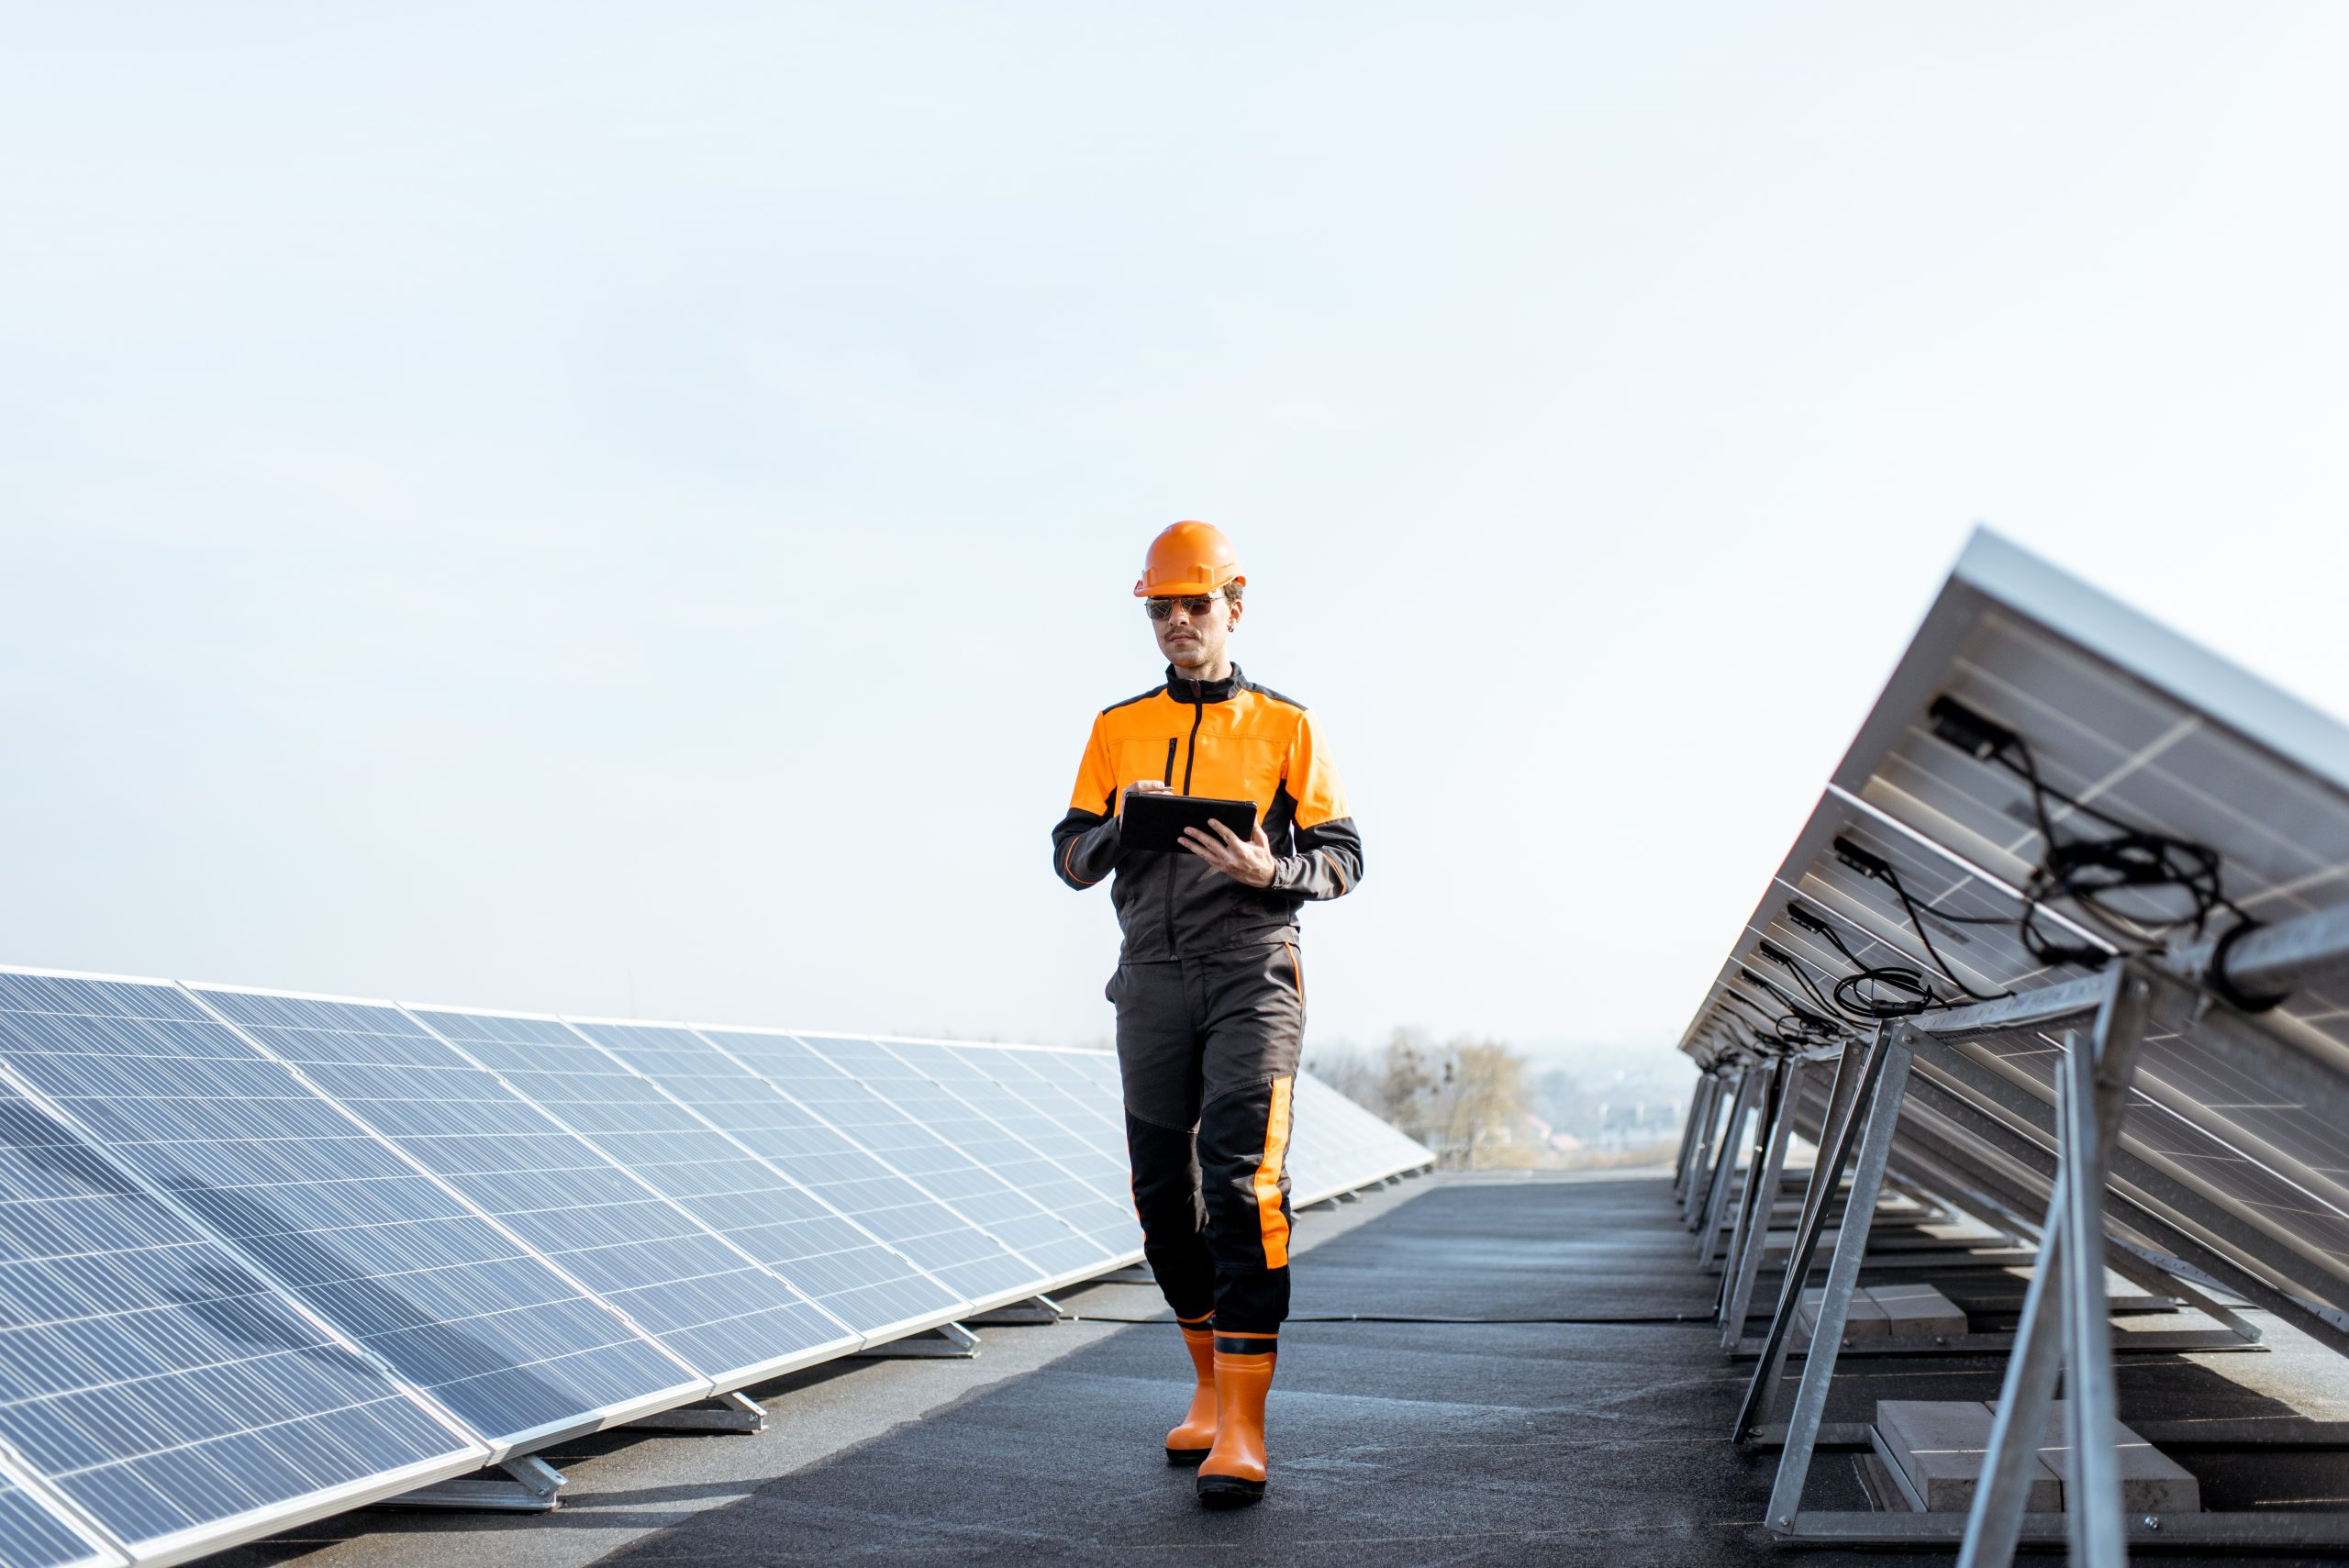 operator among solar pannels